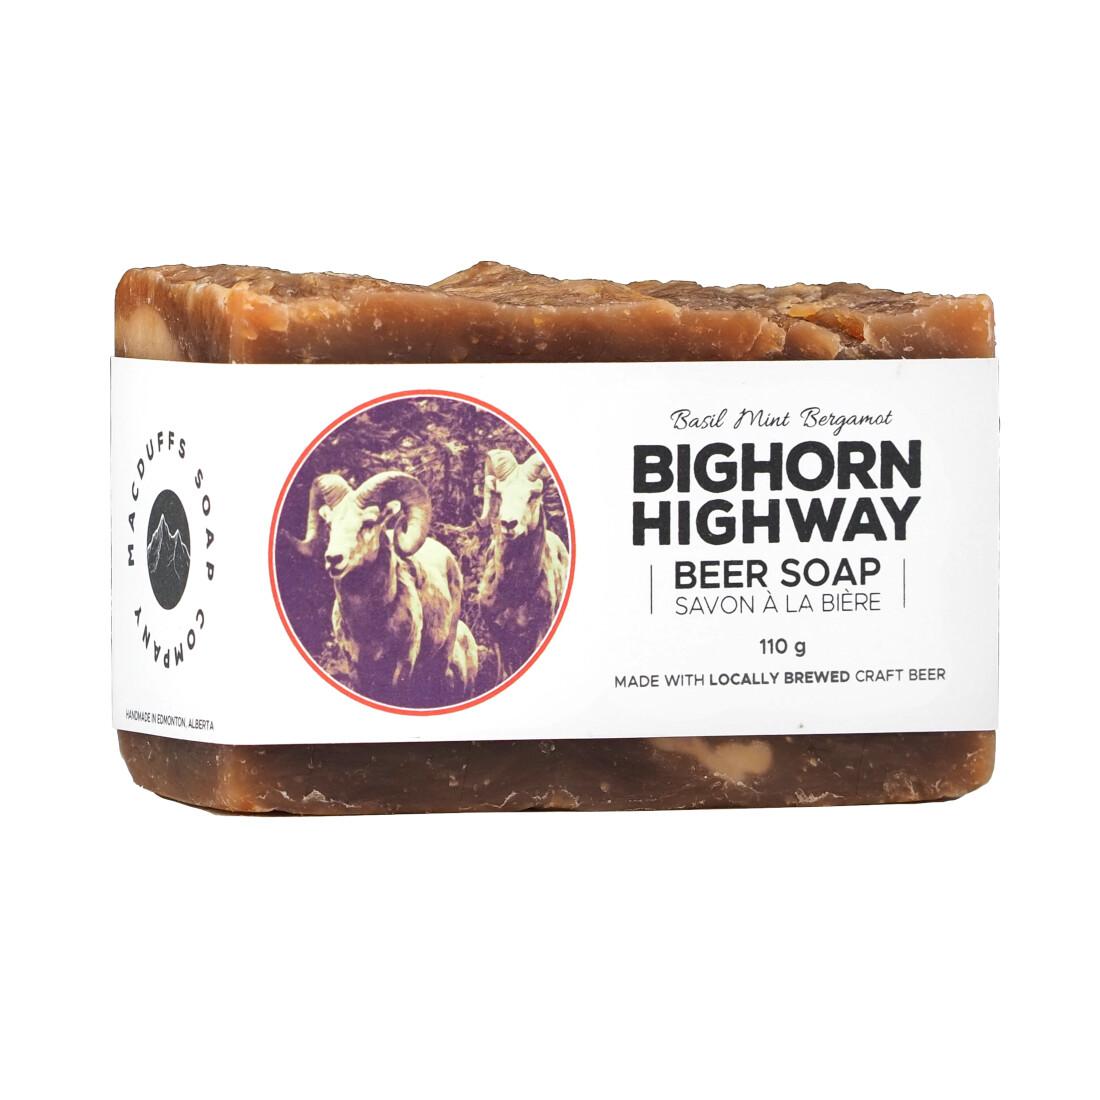 Bighorn Highway Beer Soap